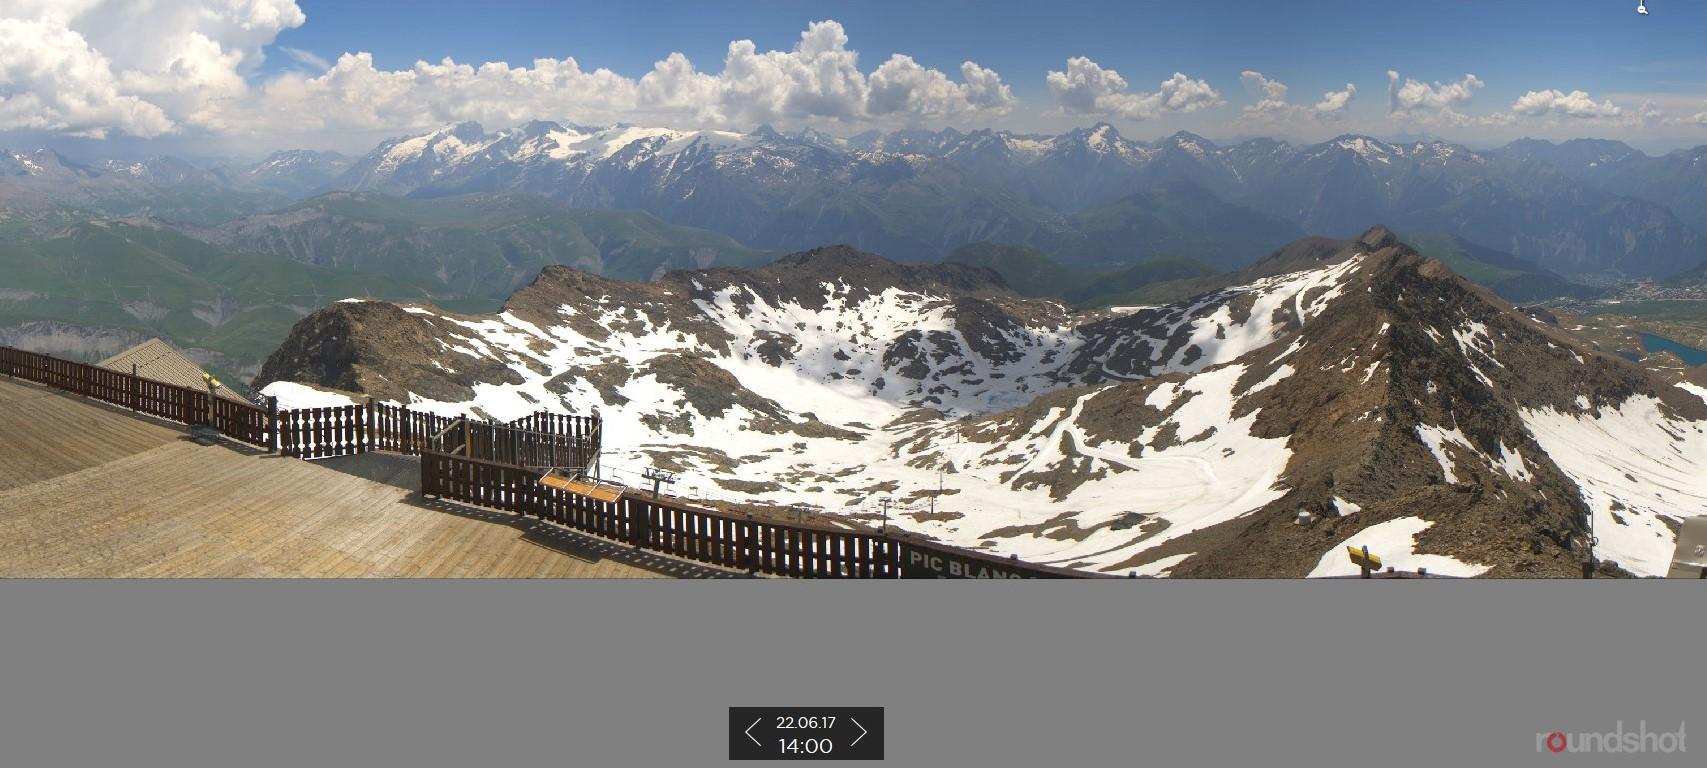 Nowcasting nivoglaciale Alpi estate 2018-alpe-dhuez-22.06.17.jpg